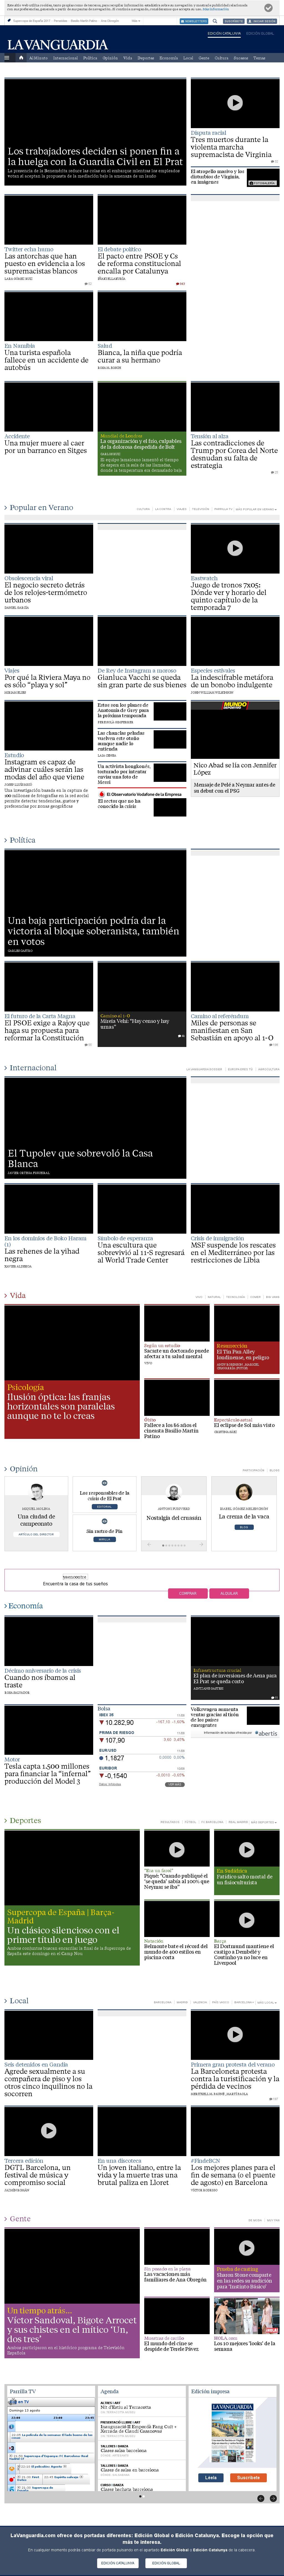 La Vanguardia at Sunday Aug. 13, 2017, 10:21 a.m. UTC